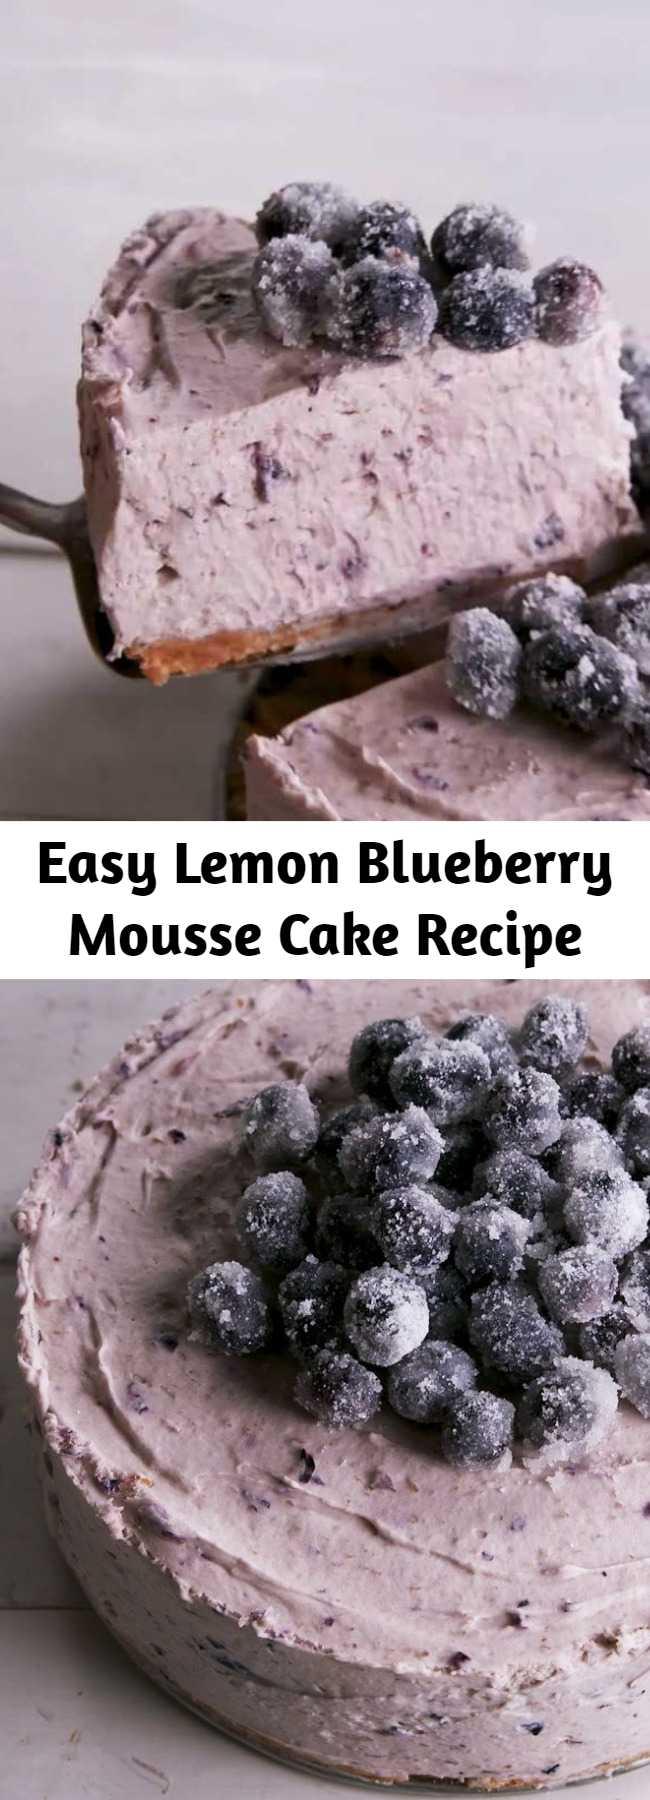 Easy Lemon Blueberry Mousse Cake Recipe - When life gives you lemons, don't make lemonade. his lemon blueberry mousse cake is the spring showstopper you've been looking for. #easy #recipe #lemon #blueberry #mousse #Moussecake #baking